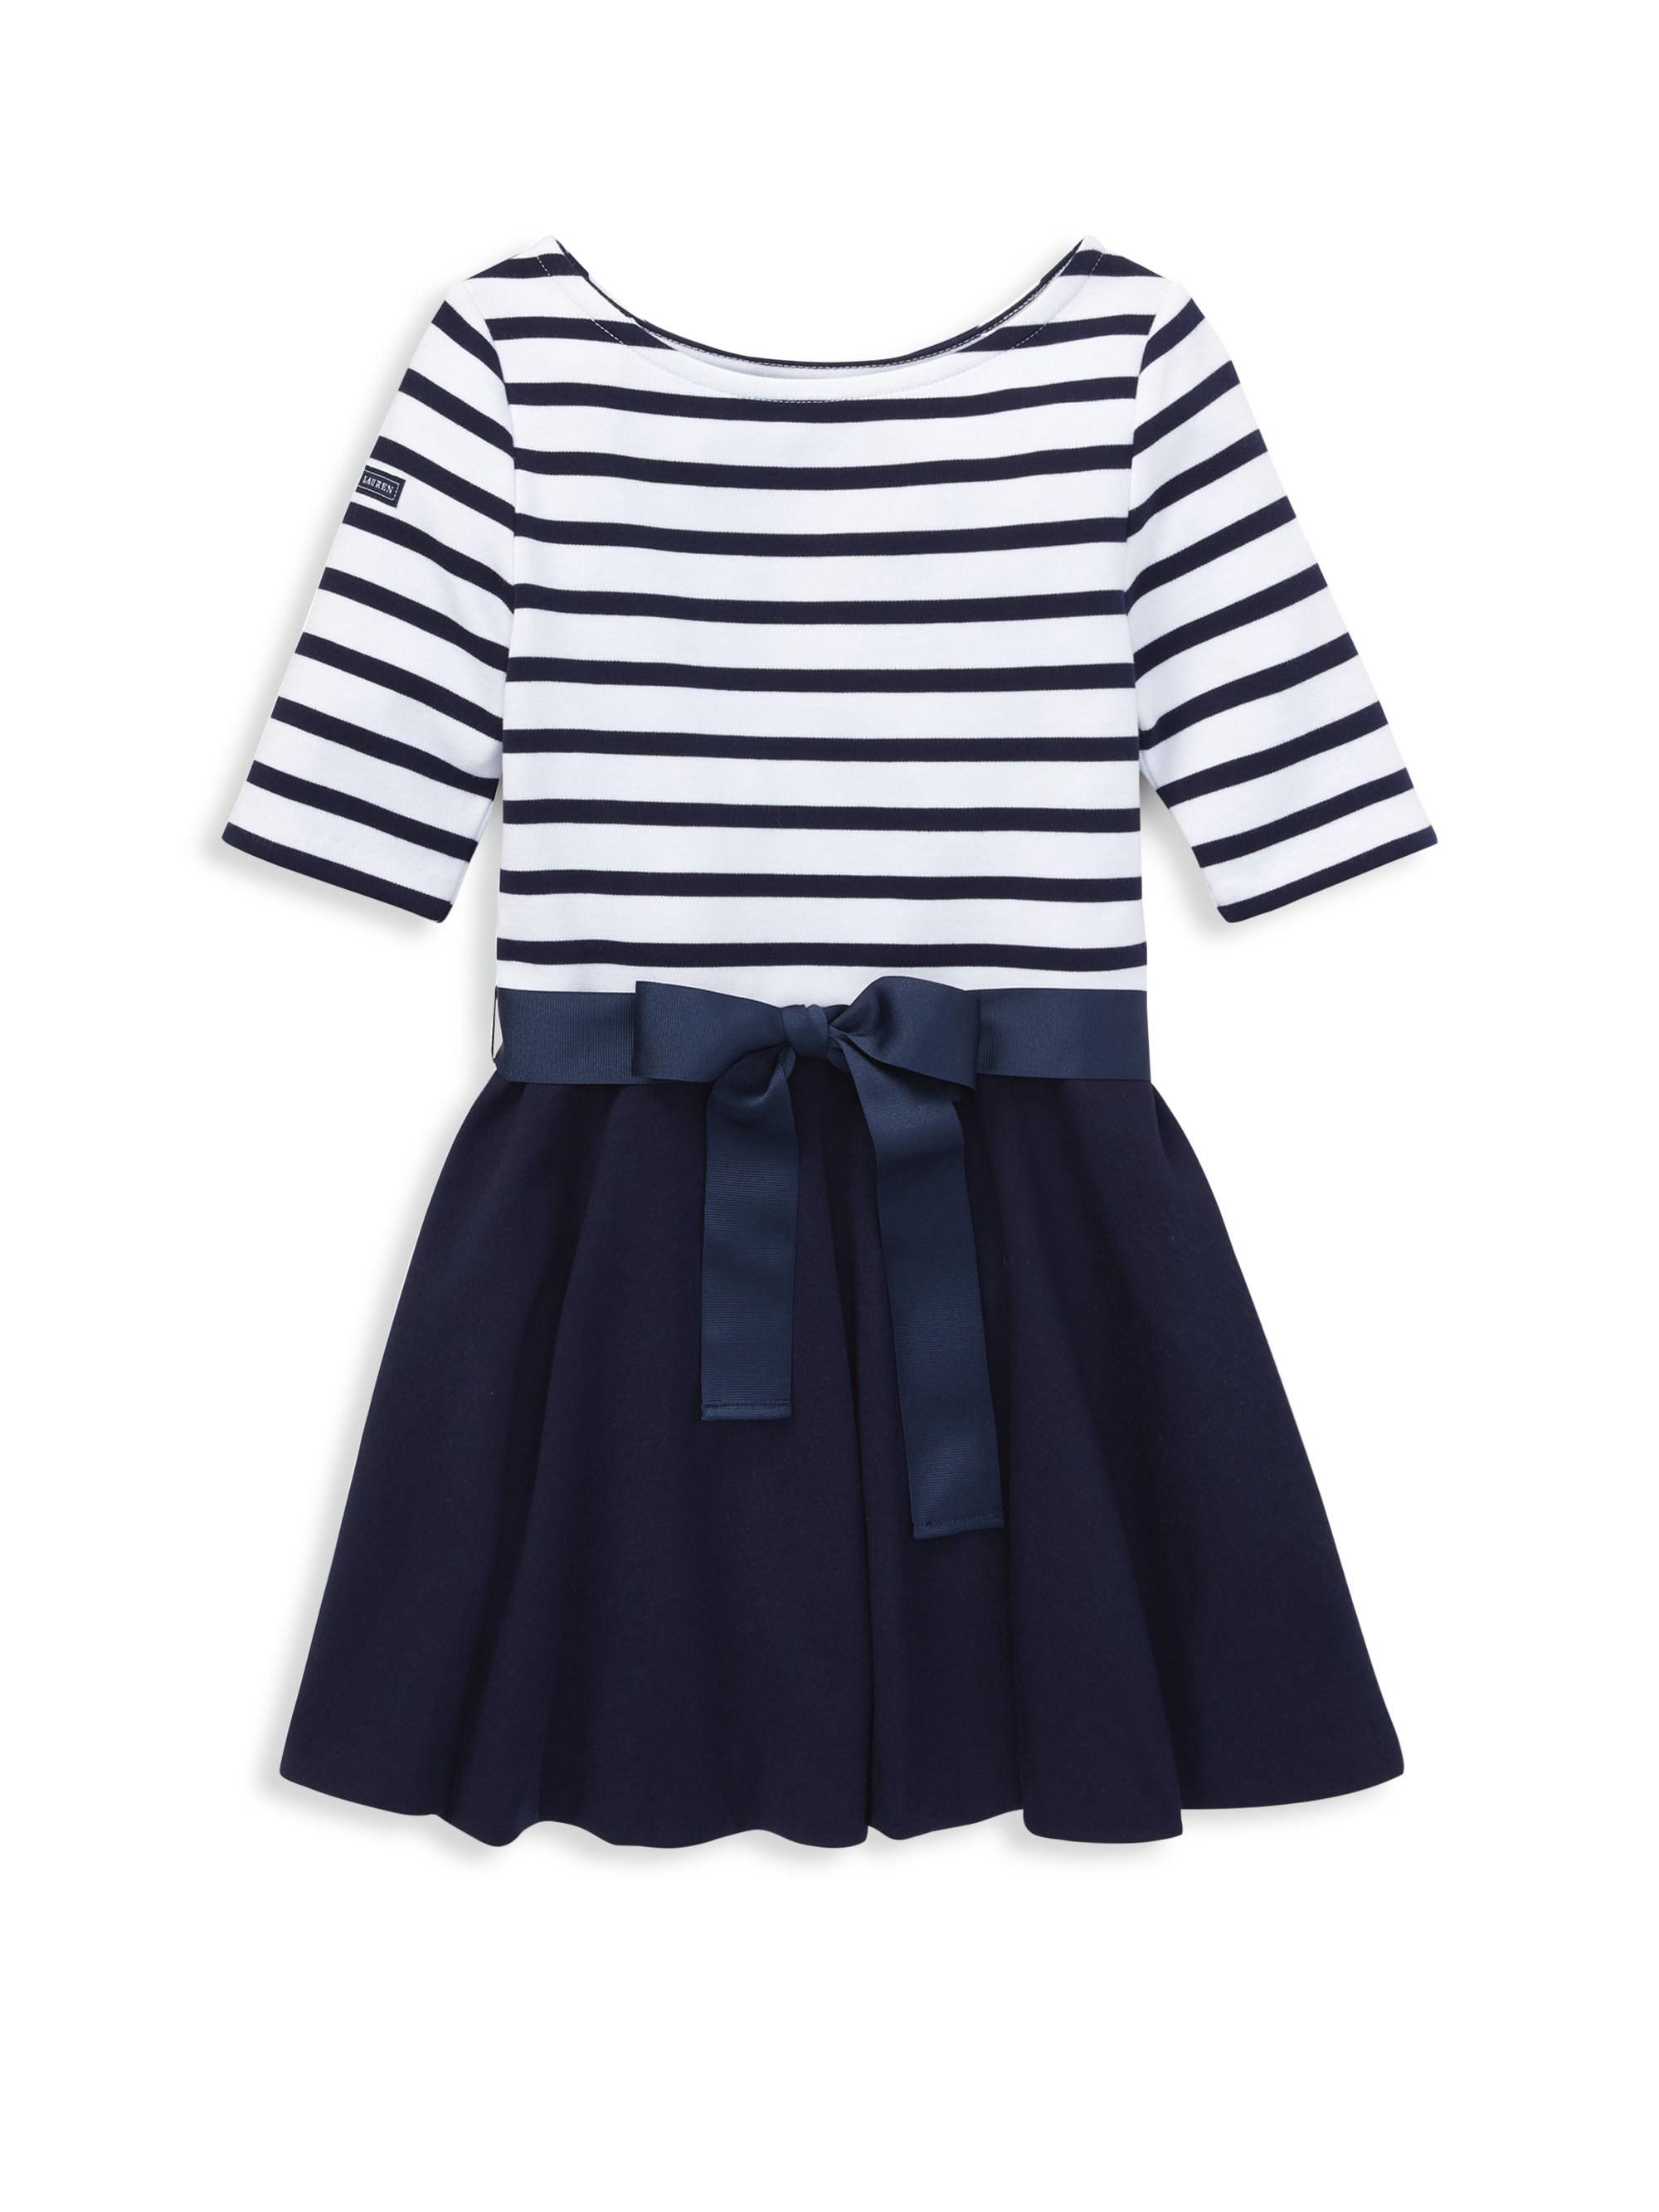 2eb1ee261c985 Ralph Lauren Little Girl's Stripe Fit-&-Flare Dress - French Navy 6X ...